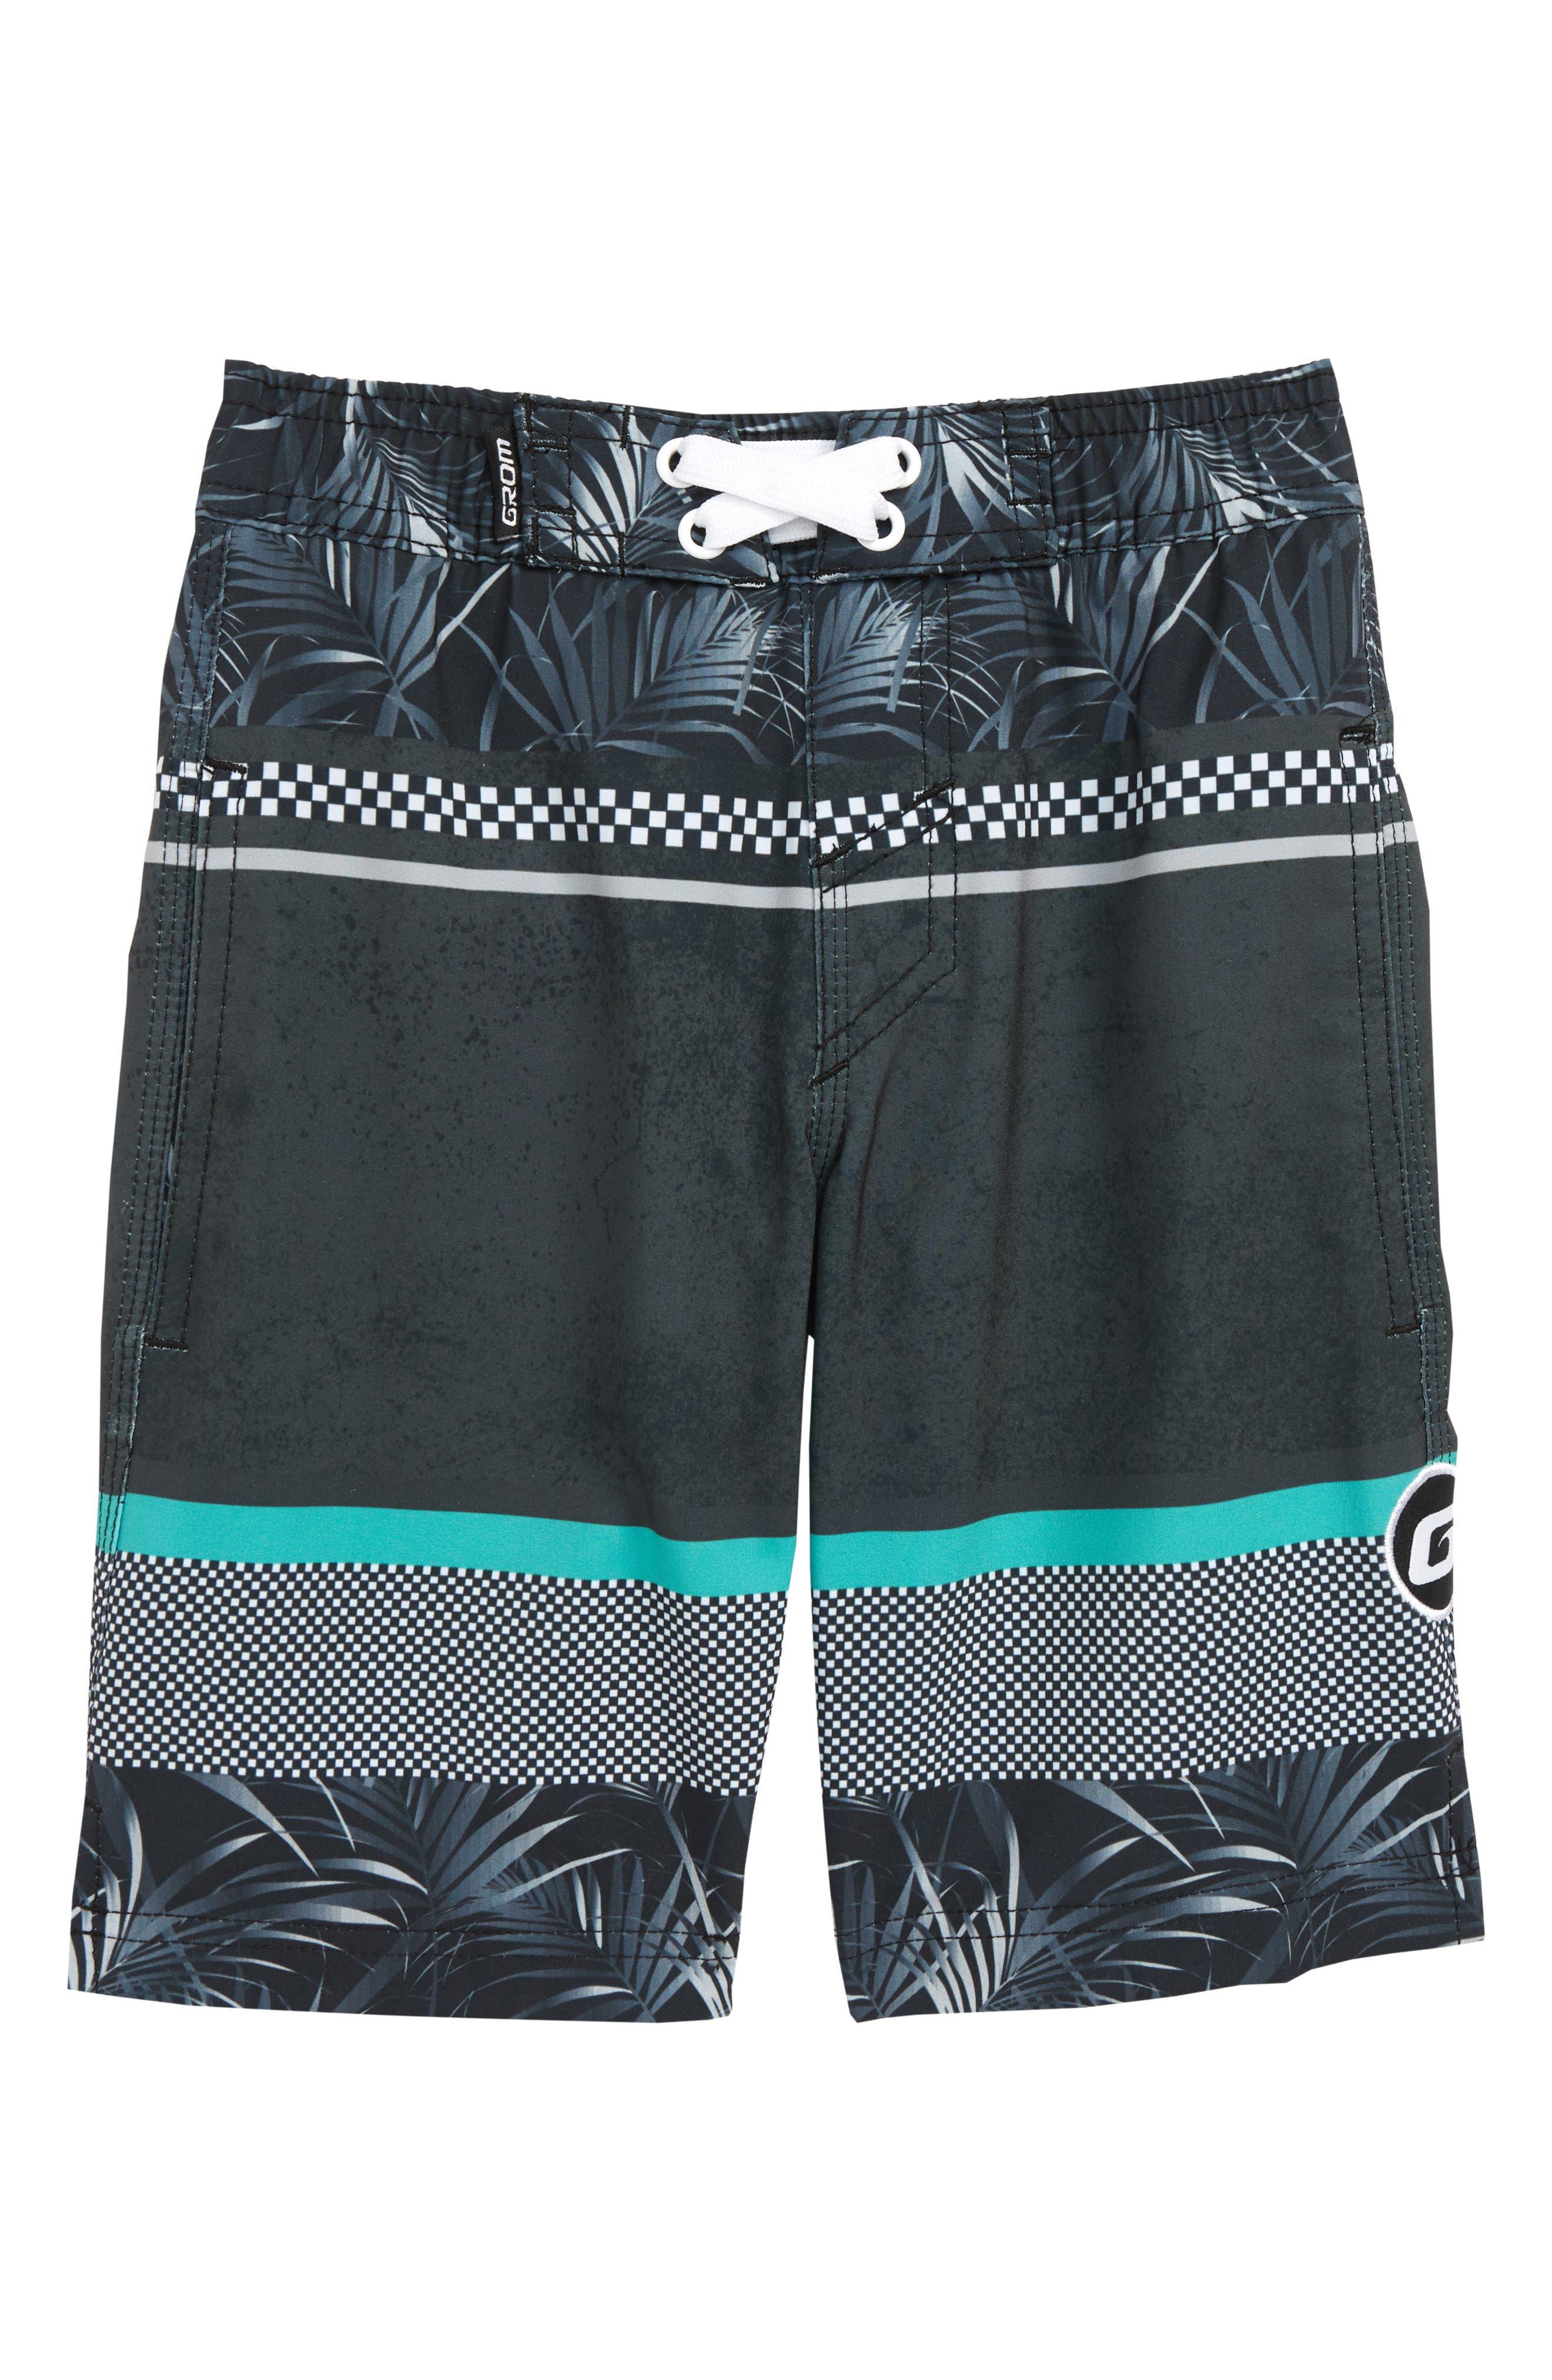 Beachbreak Board Shorts,                             Main thumbnail 1, color,                             001